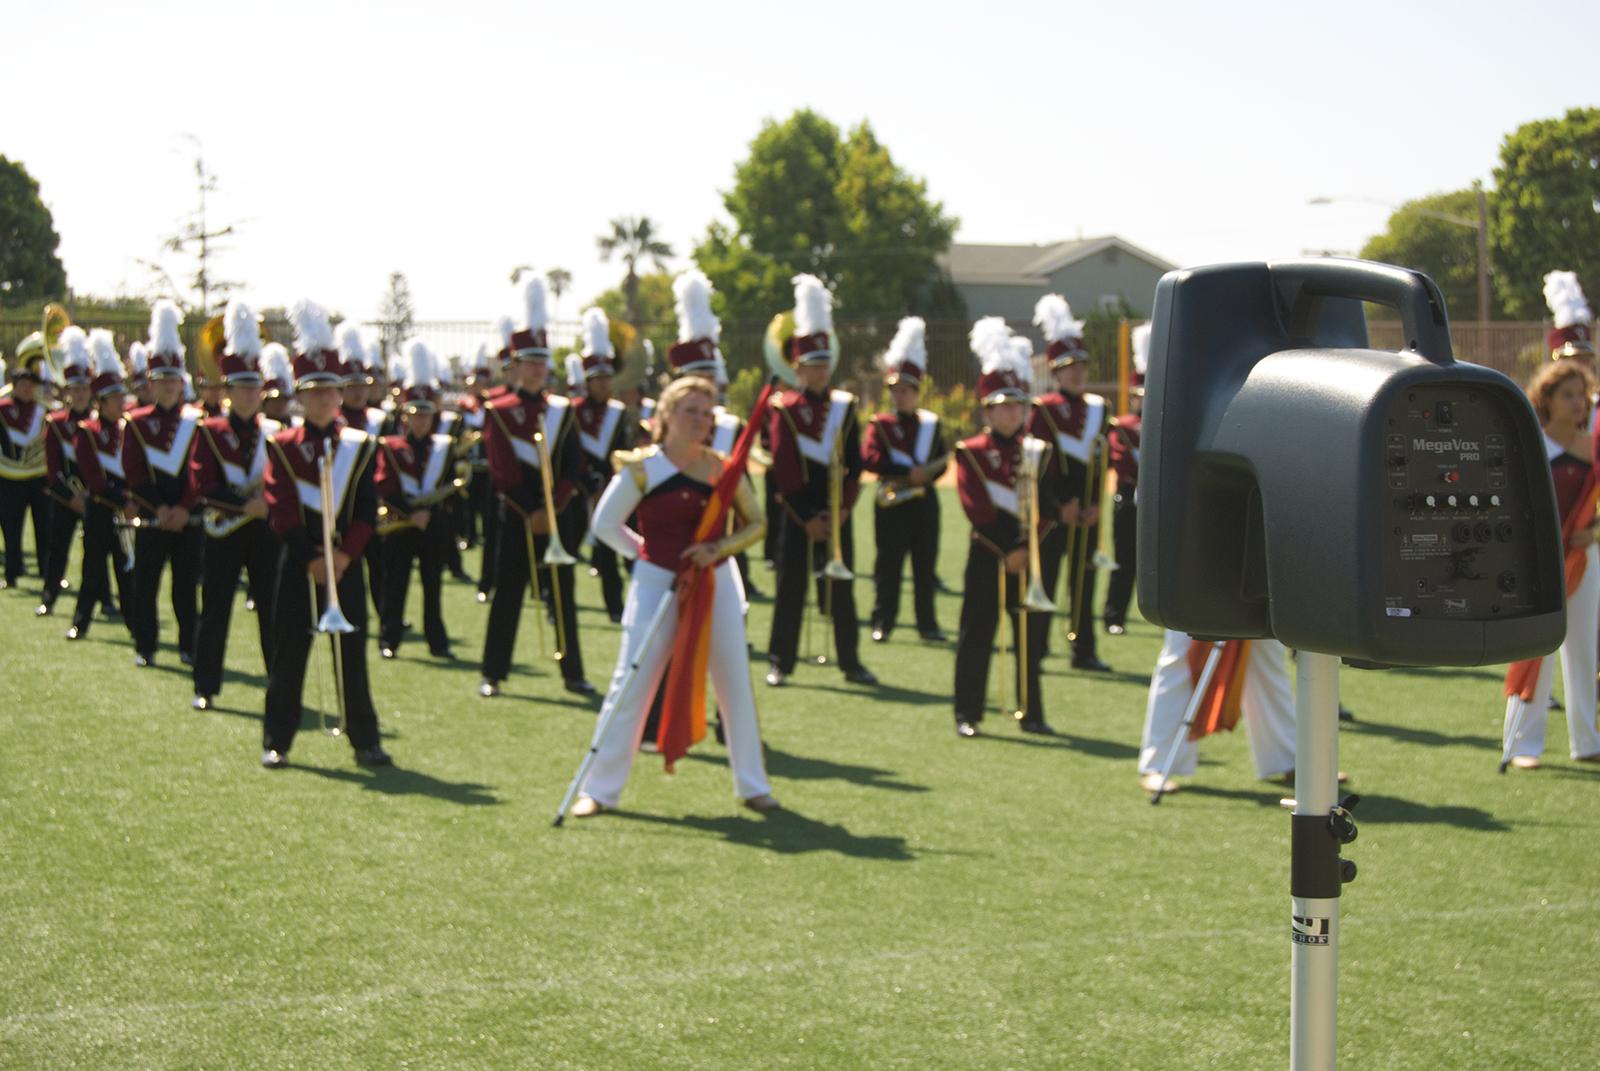 Point Loma High School - MegaVox